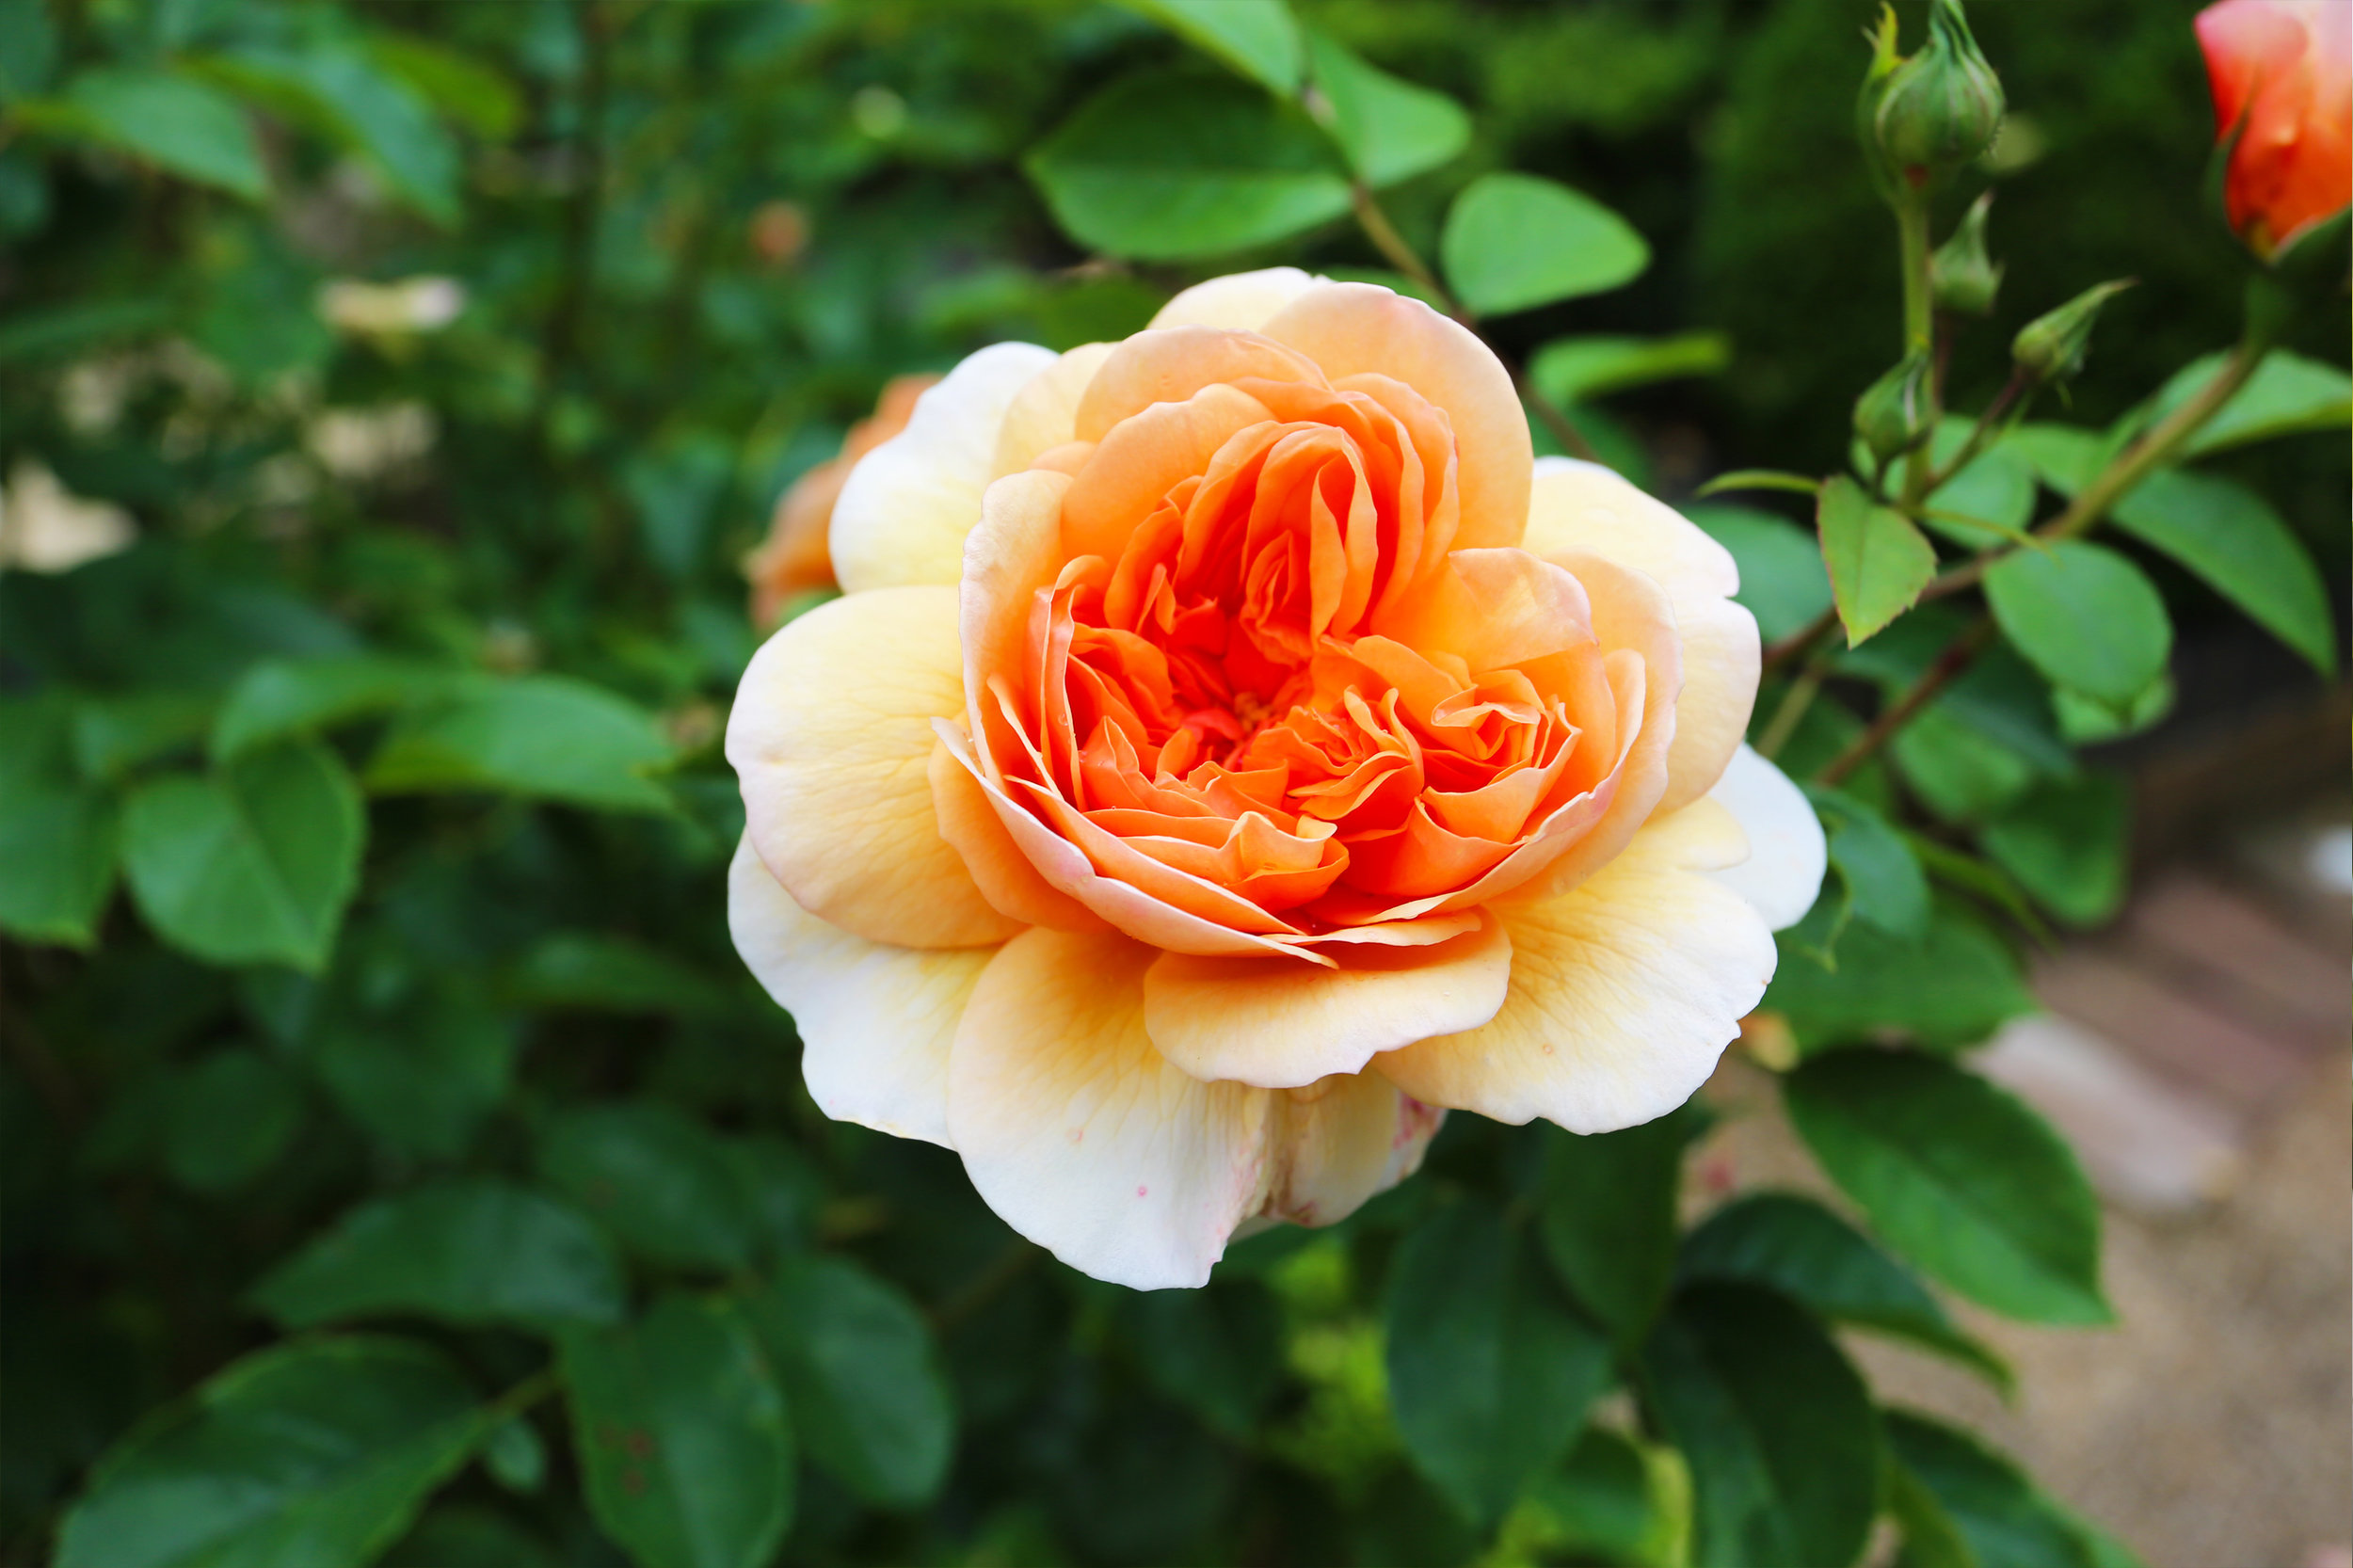 rose_orange.jpg